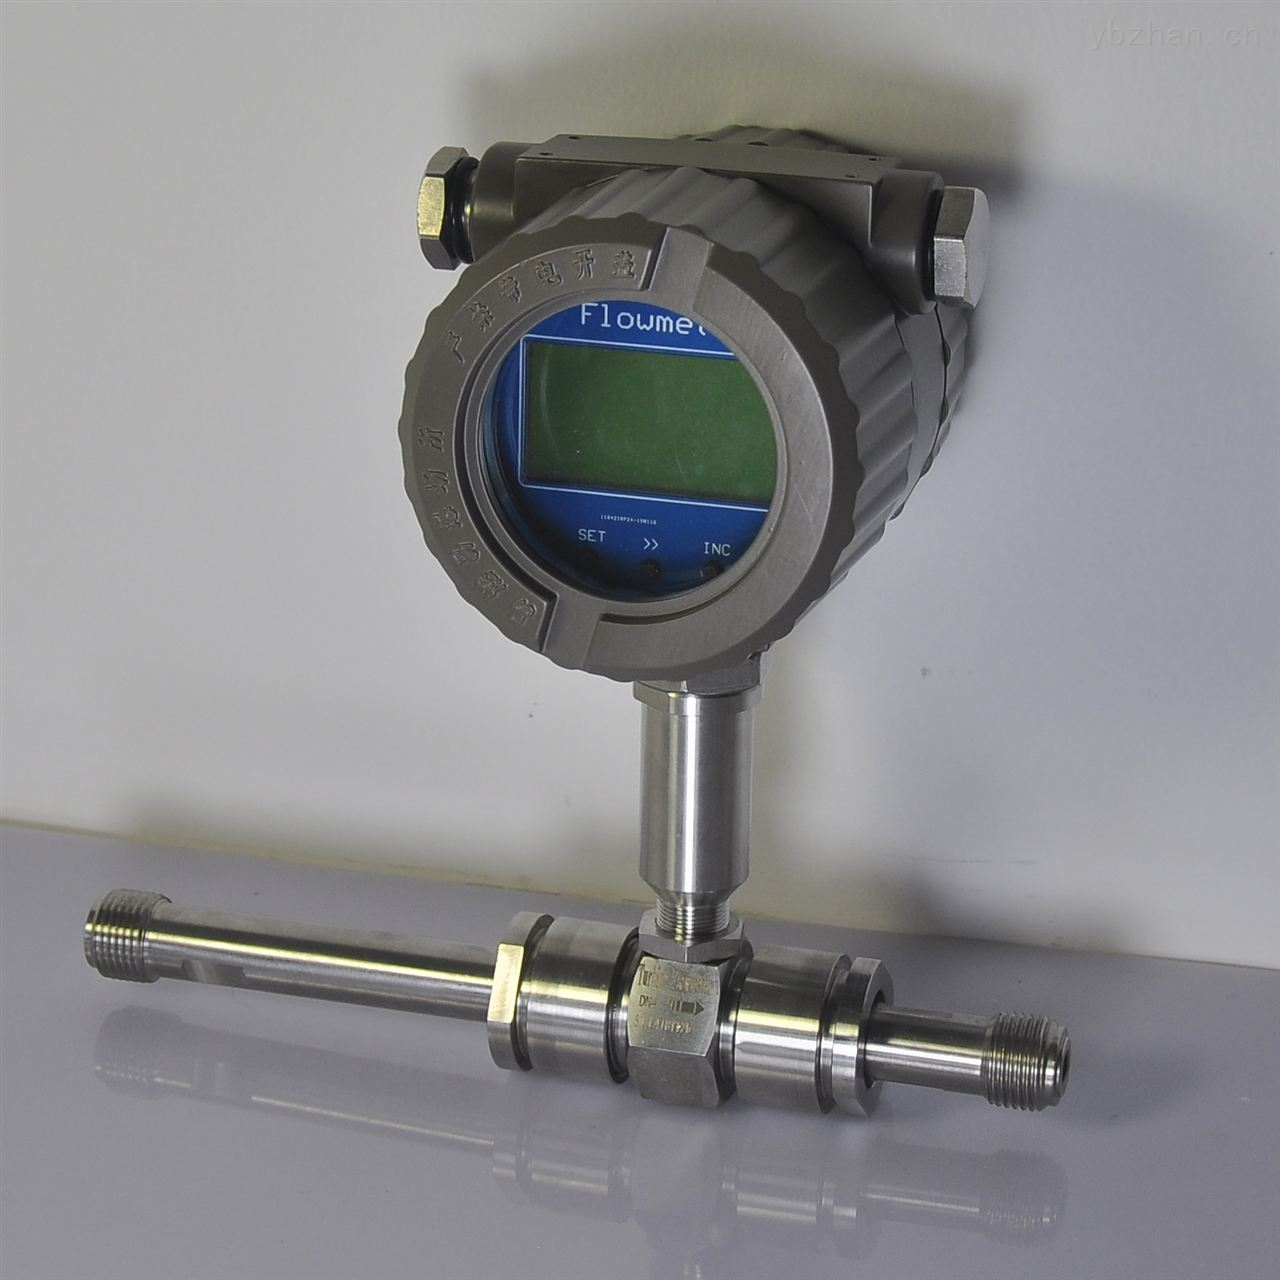 LWGY-東莞螺紋連接制藥渦輪流量計